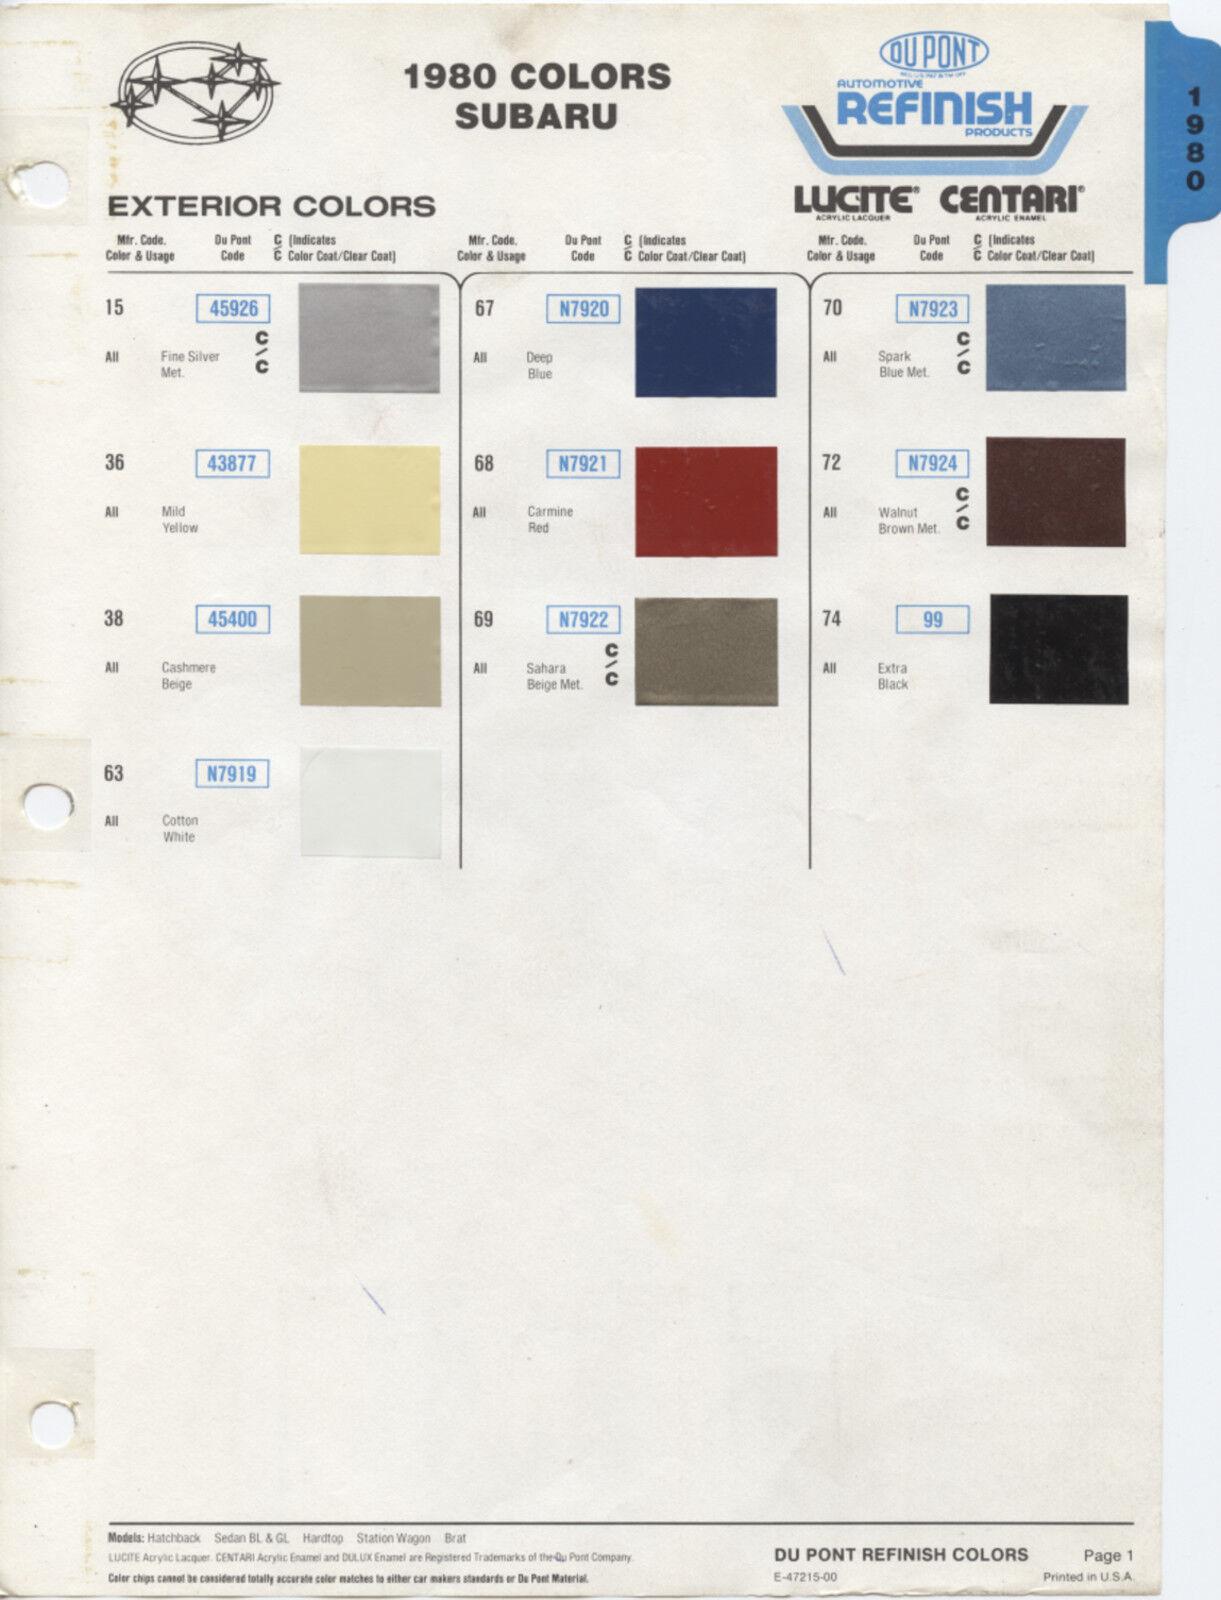 1980 Subaru Hatchback Sedan Hardtop Station Wagon Brat Color Paint Chips Chart